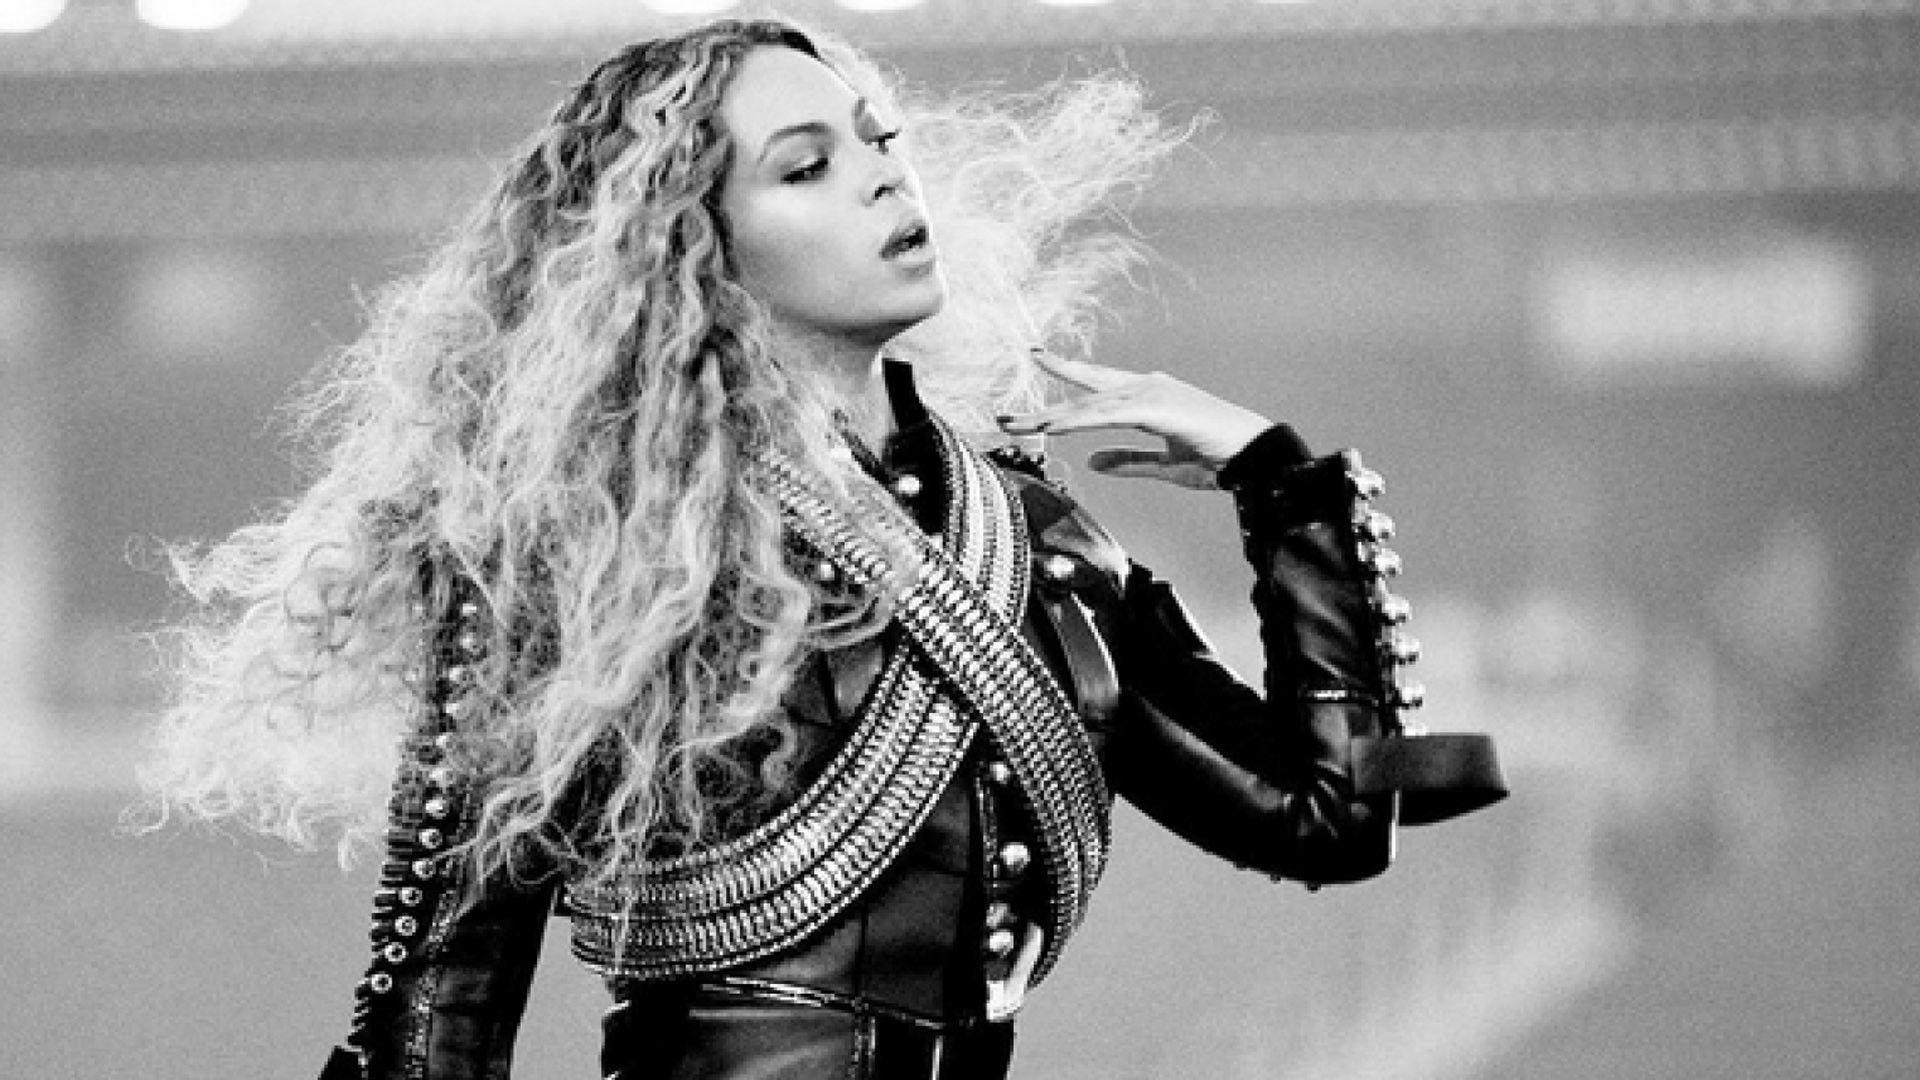 The Beautiful Beyonce Wallpaper Design Ideas